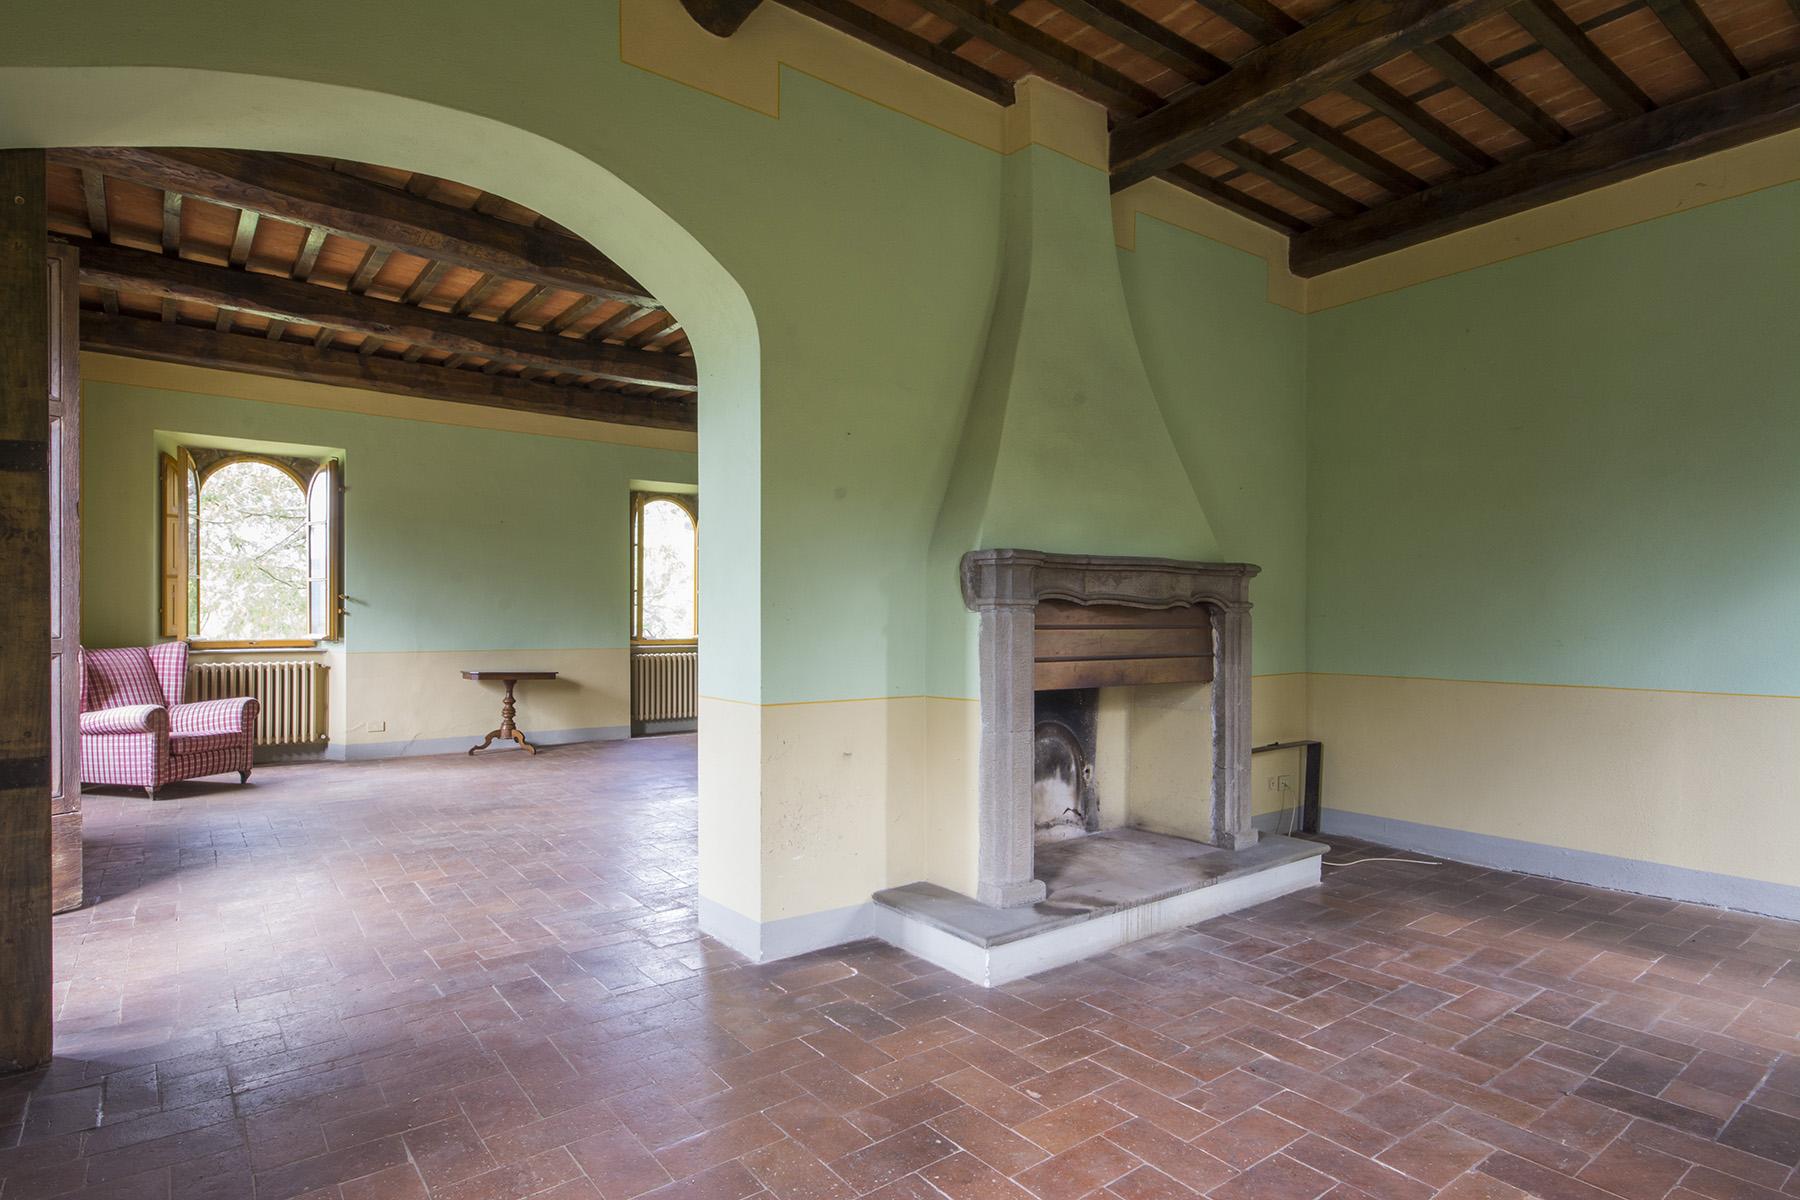 Villa in Vendita a Capannori: 5 locali, 490 mq - Foto 6